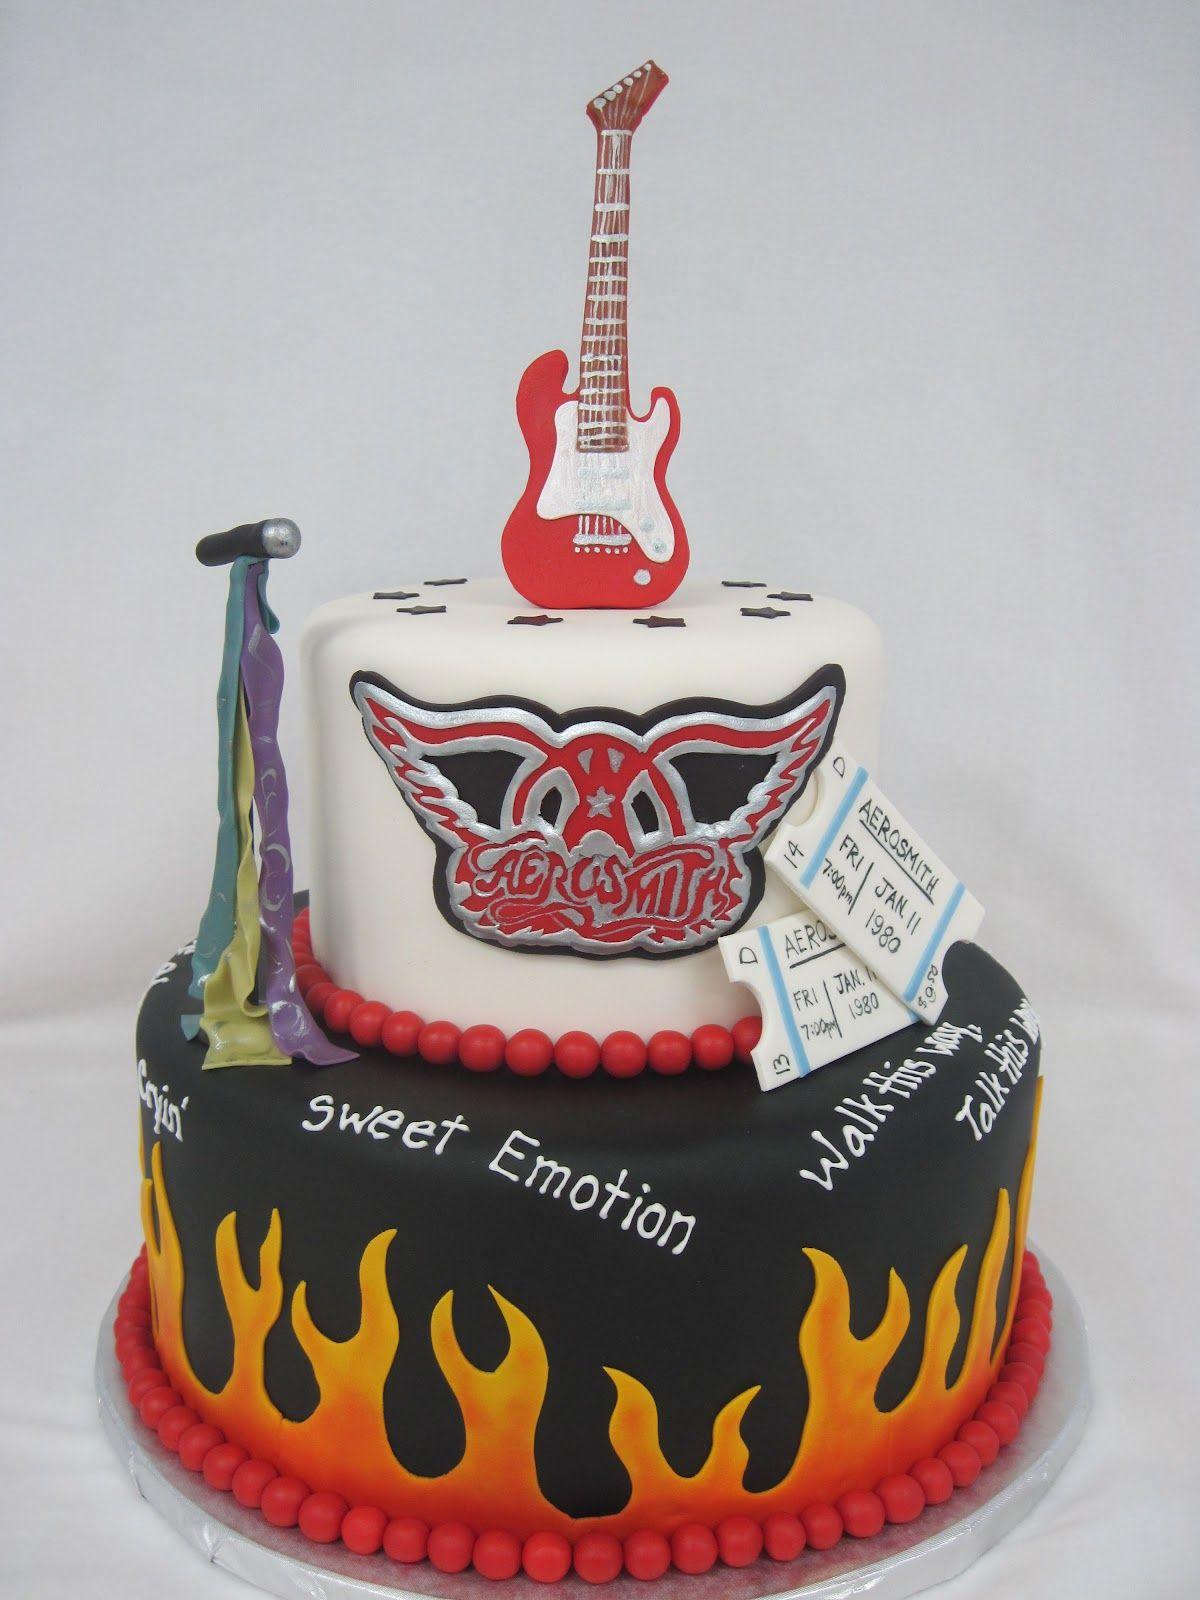 Pin by Pam on Aerosmith Pinterest Aerosmith and Cake